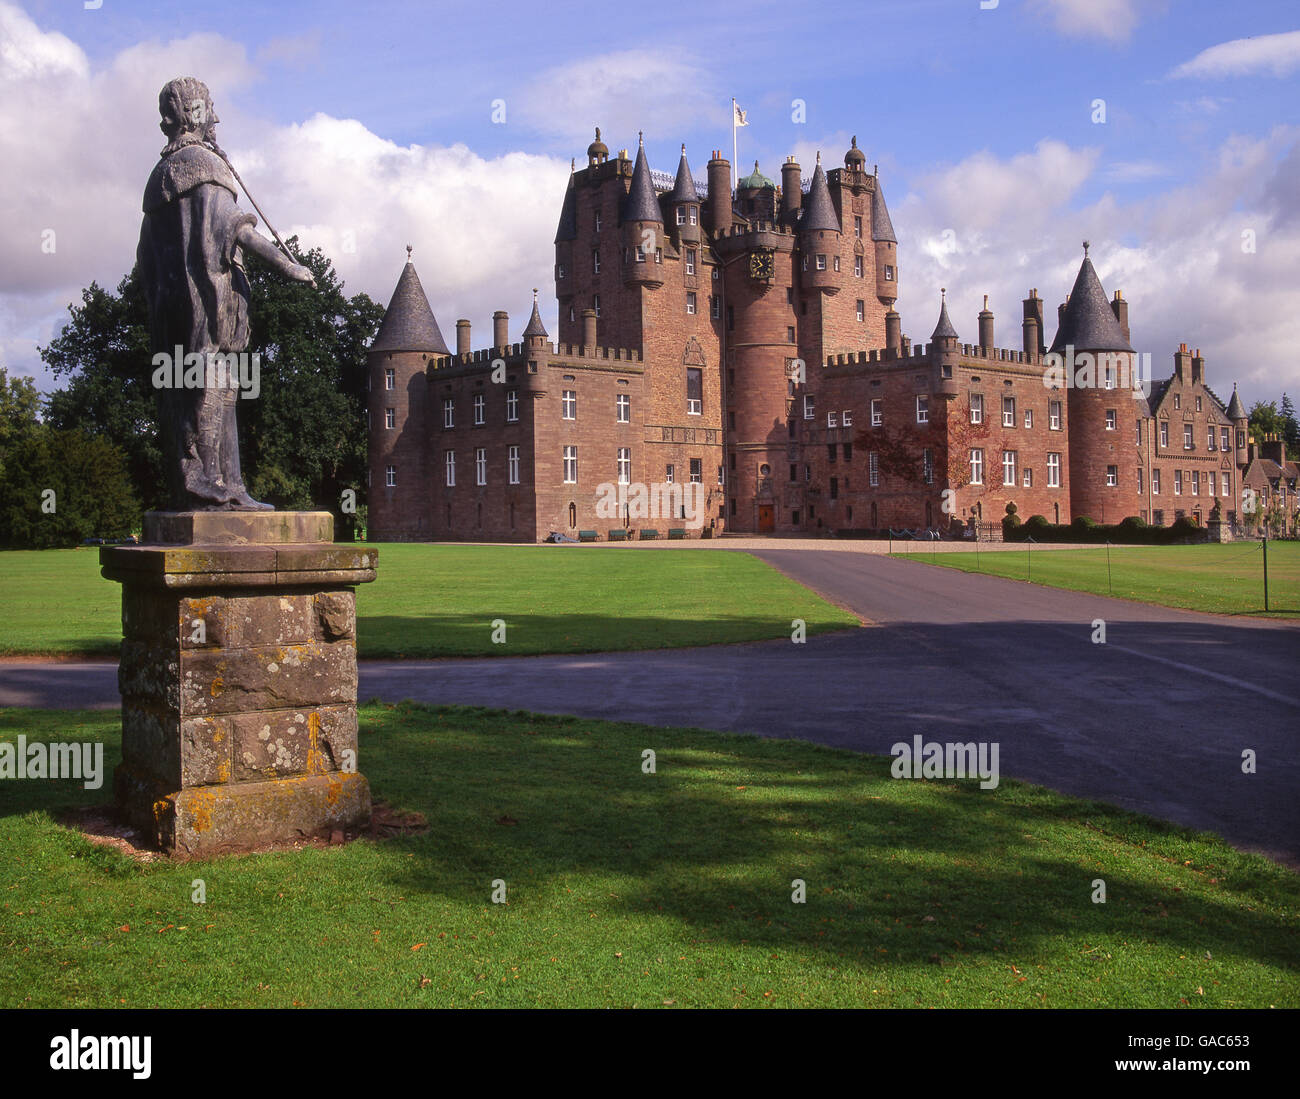 Glamis Castle, Angus, N/E Scotland - Stock Image